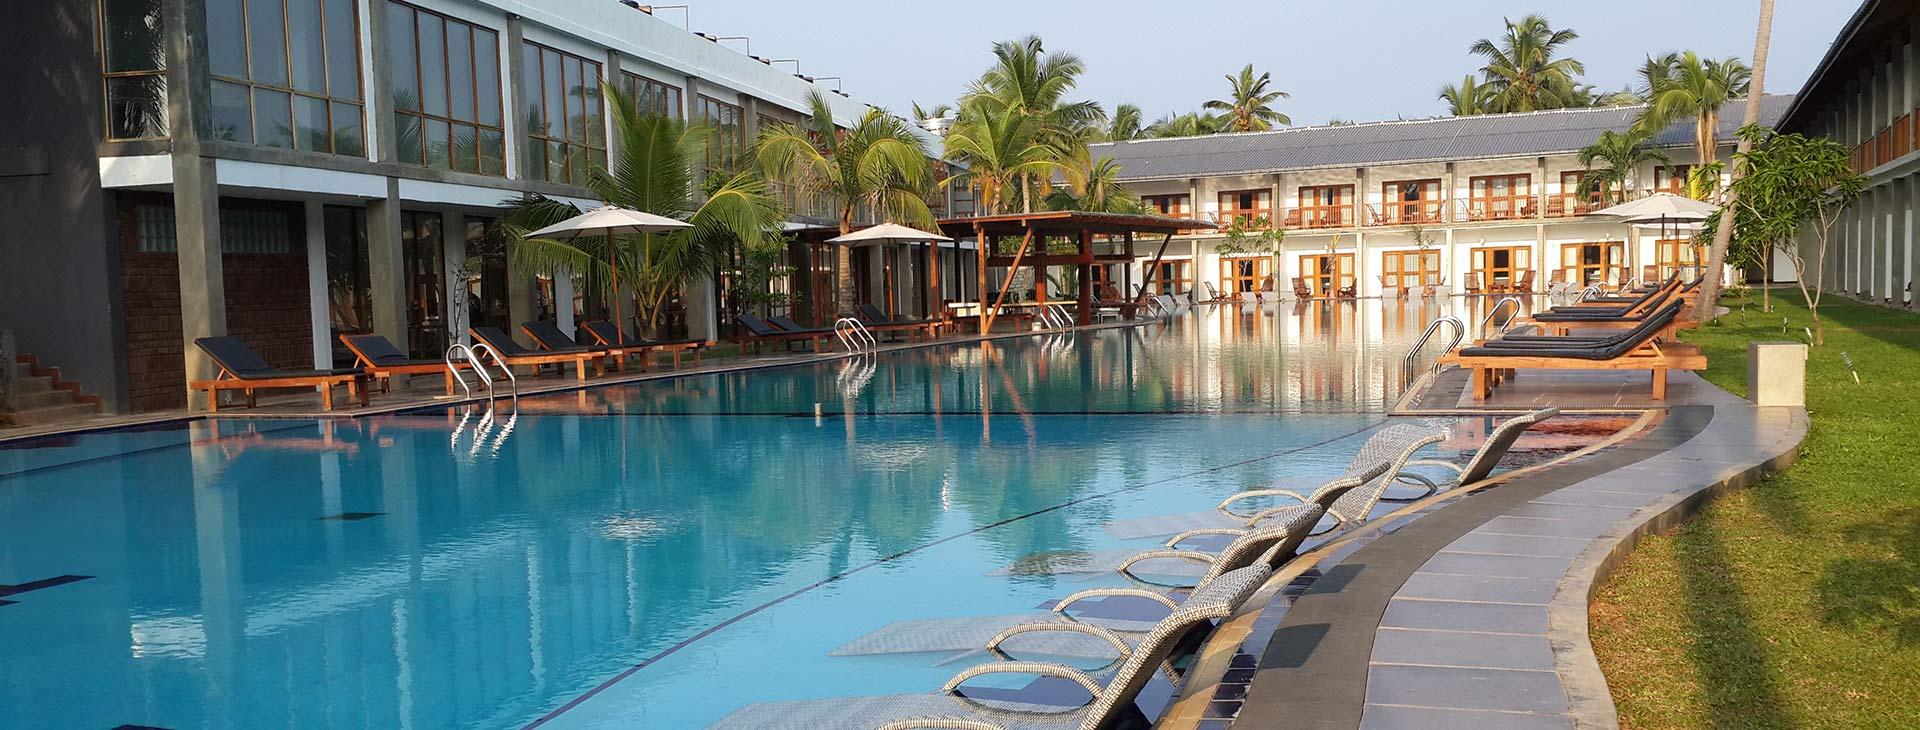 Carolina Beach Sri Lanka Płn. - Zach. Prowincja